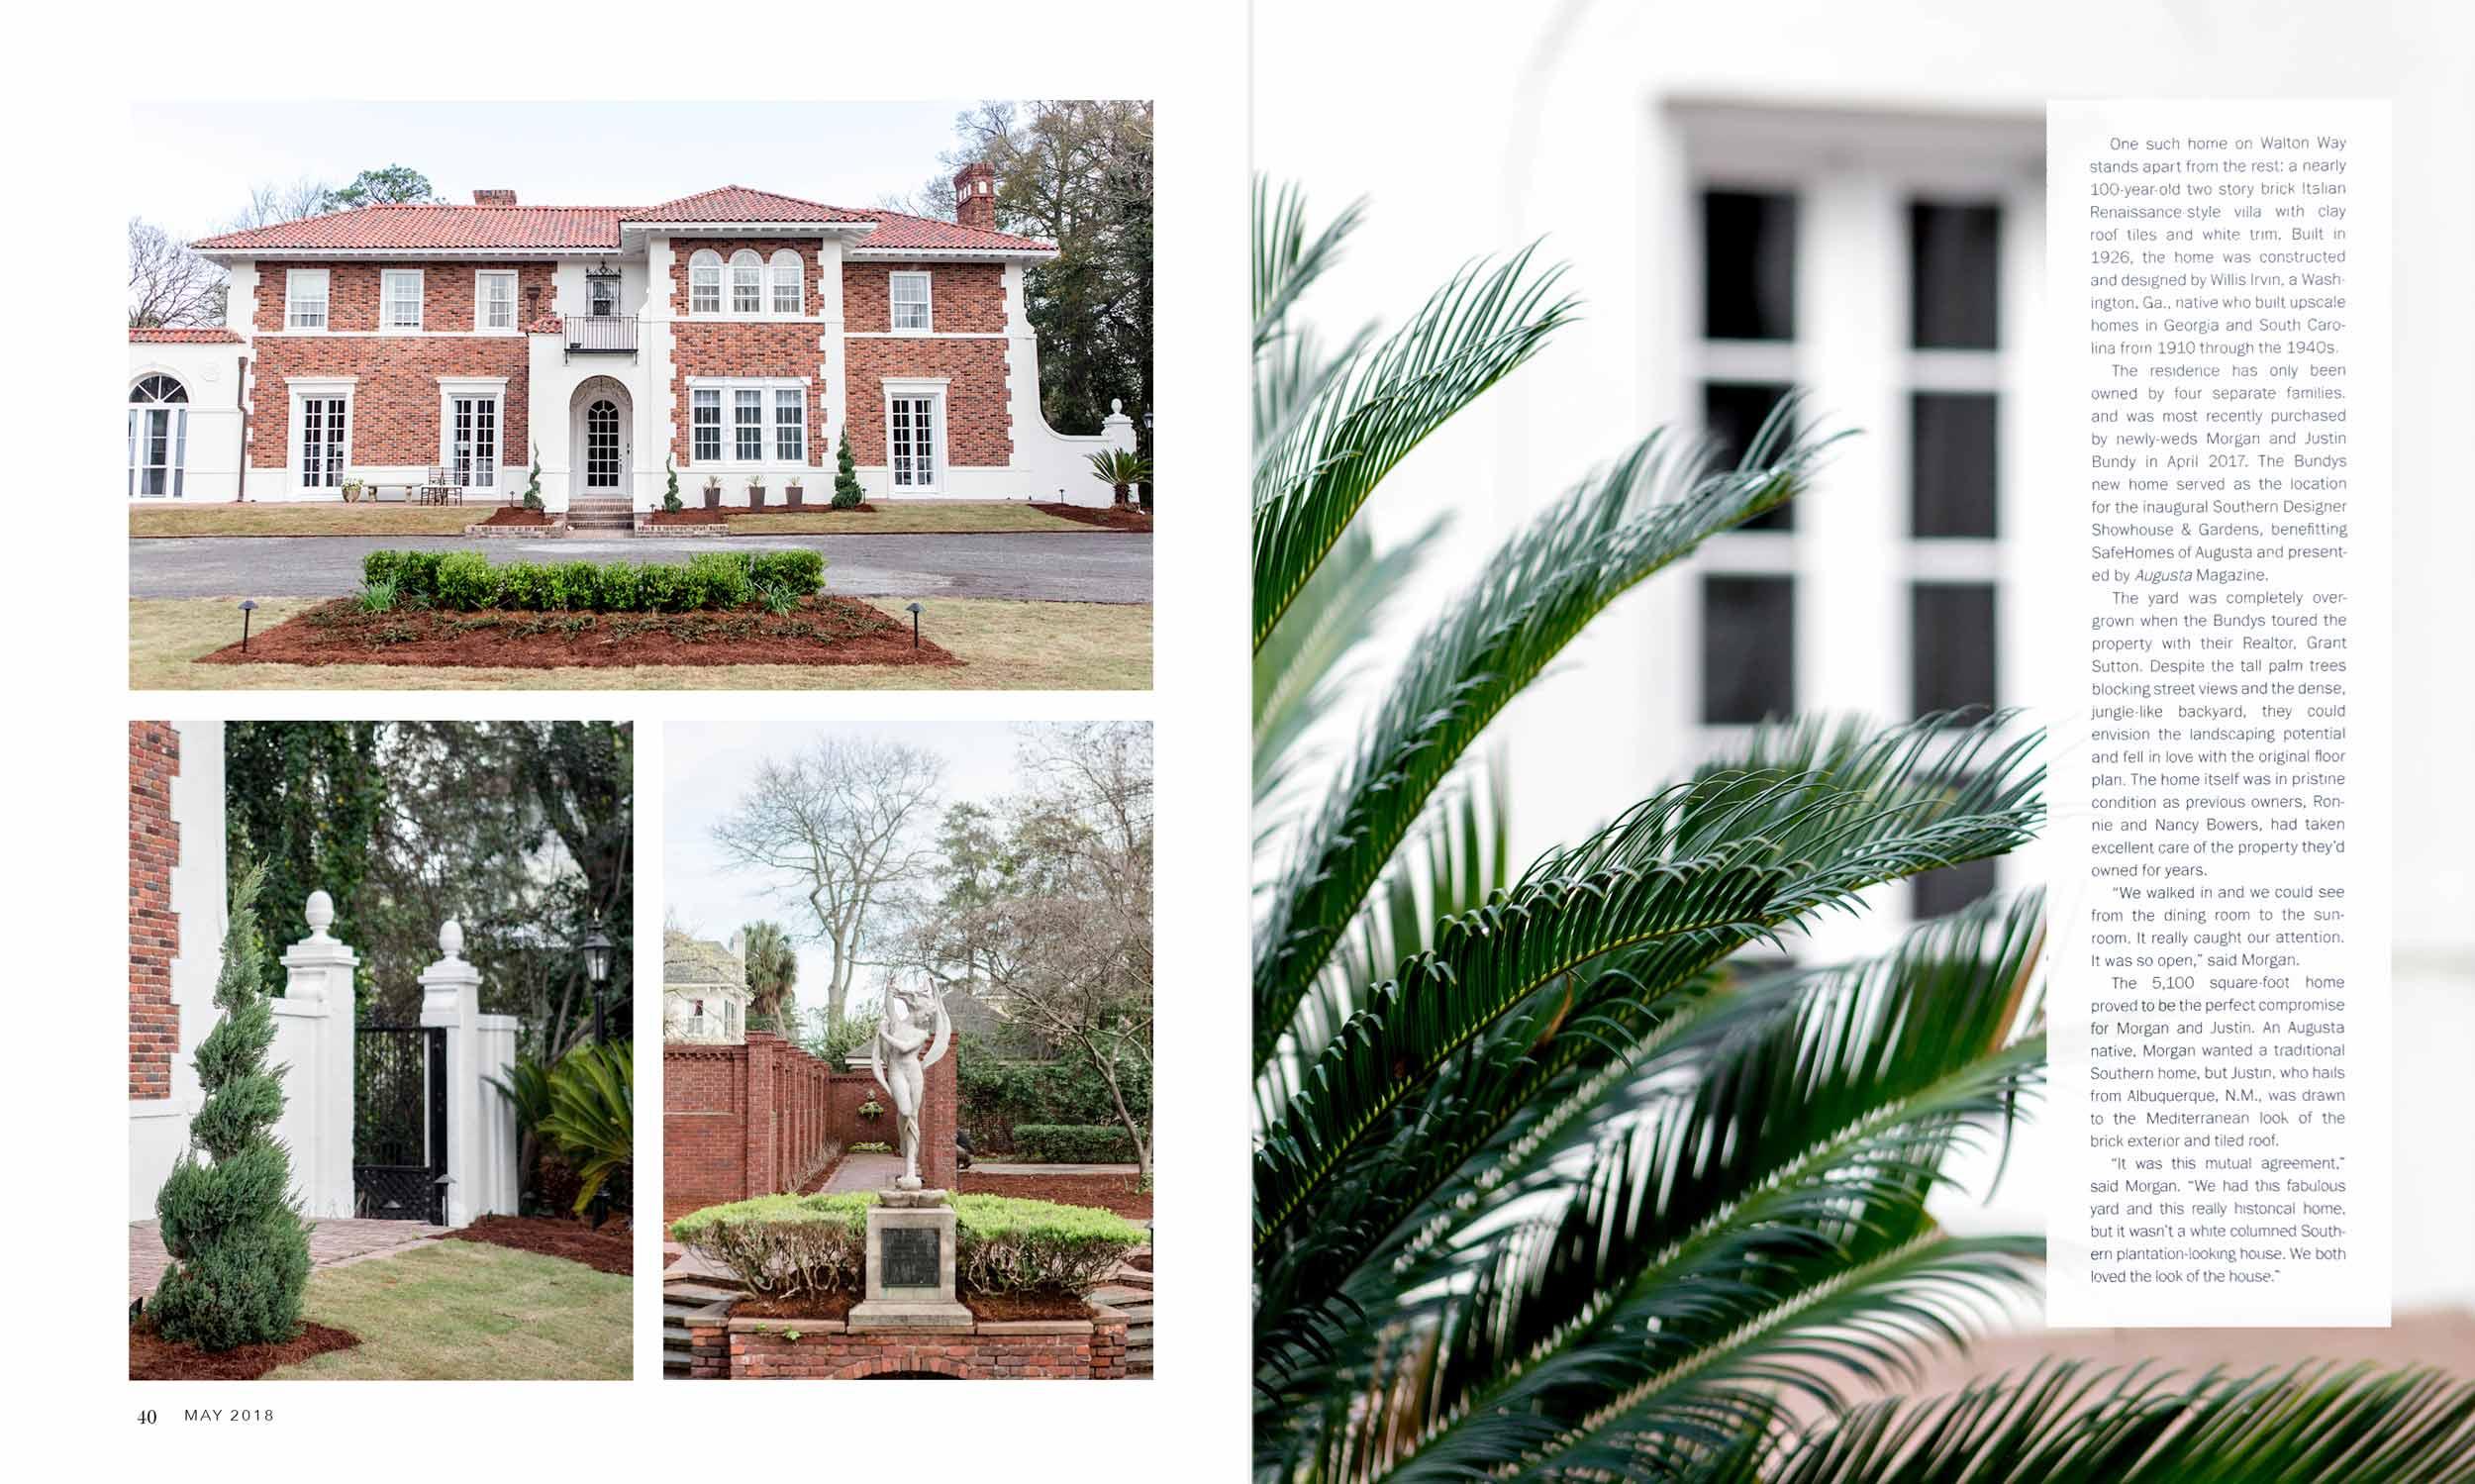 Brittany_Cason_Interior_Design_Augusta_Magazine_Southern_Designer_Showhouse_and_Gardens_2.jpg